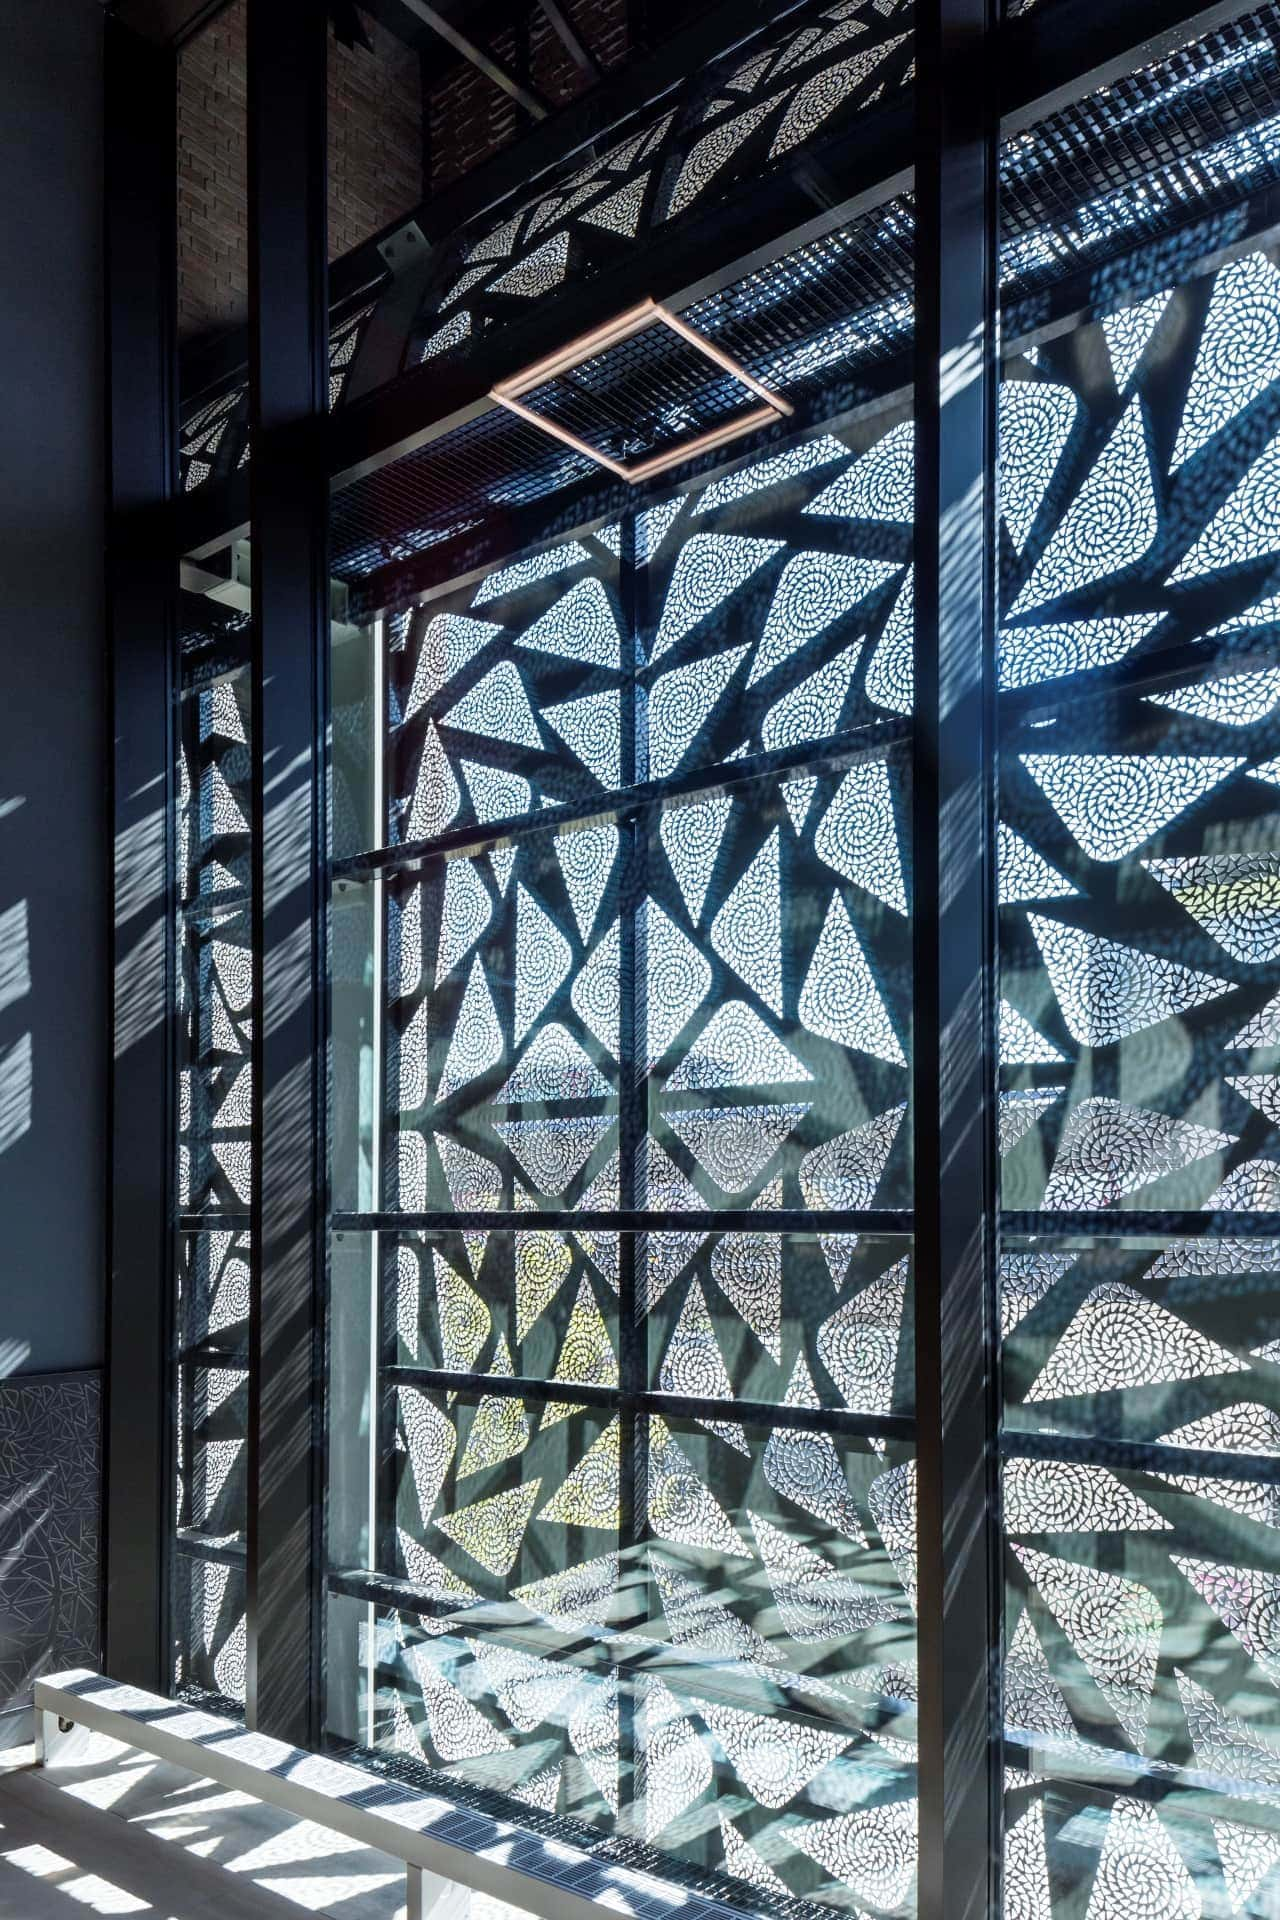 Gevelbekleding MD Designperforatie Theater Zuidplein Kunstenpand Rotterdam binnen buiten boven